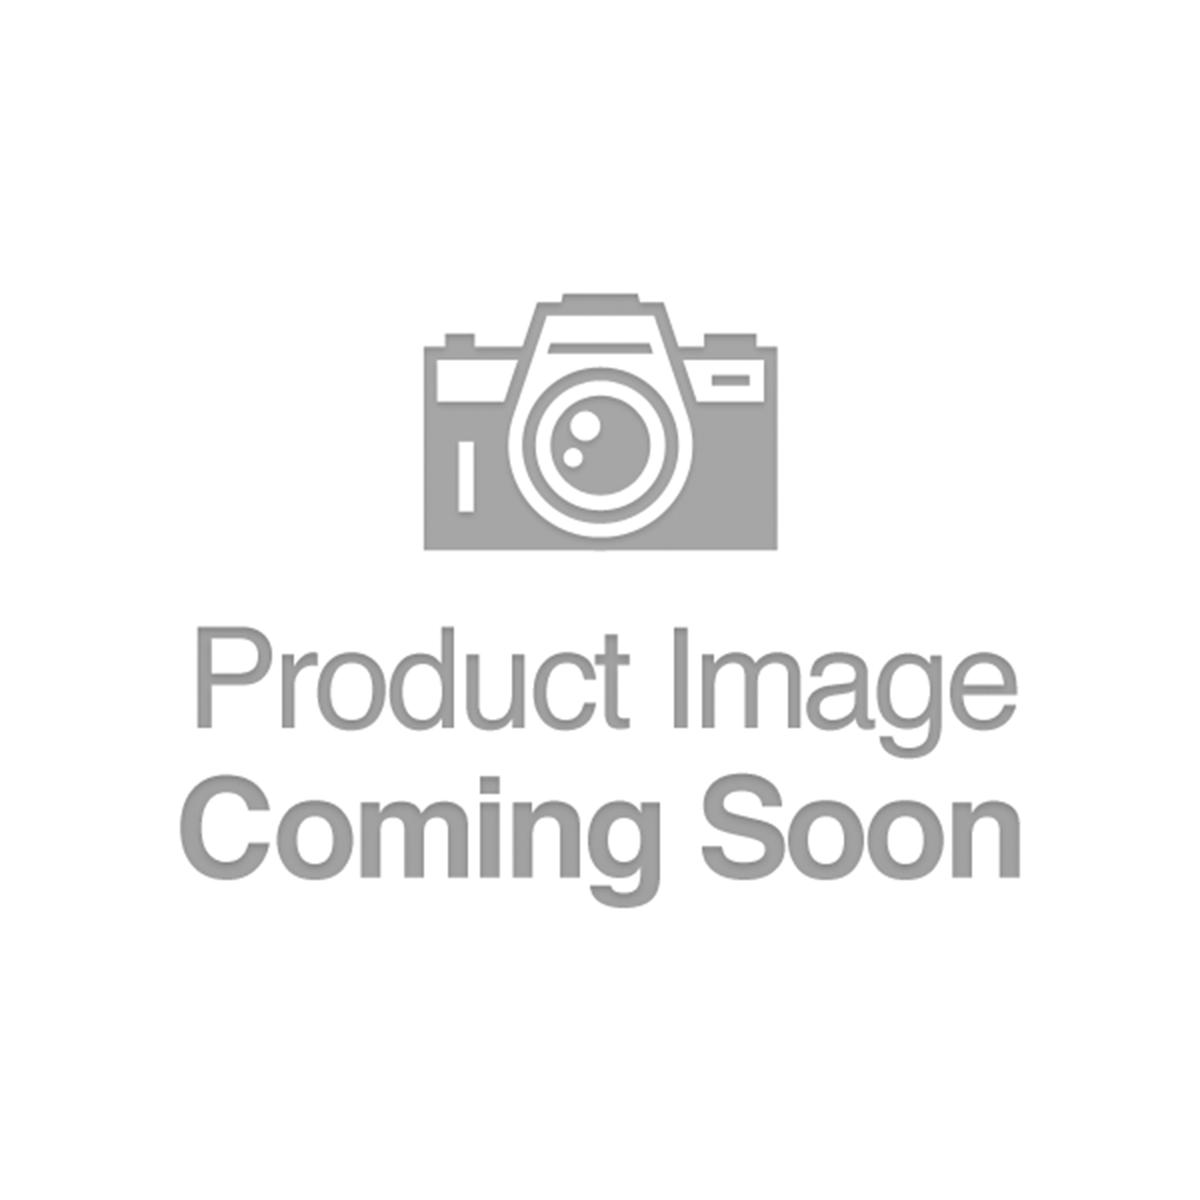 1913 10C Barber Dime PCGS PR67+, PCGS 4/0, NONE FINER AT CAC